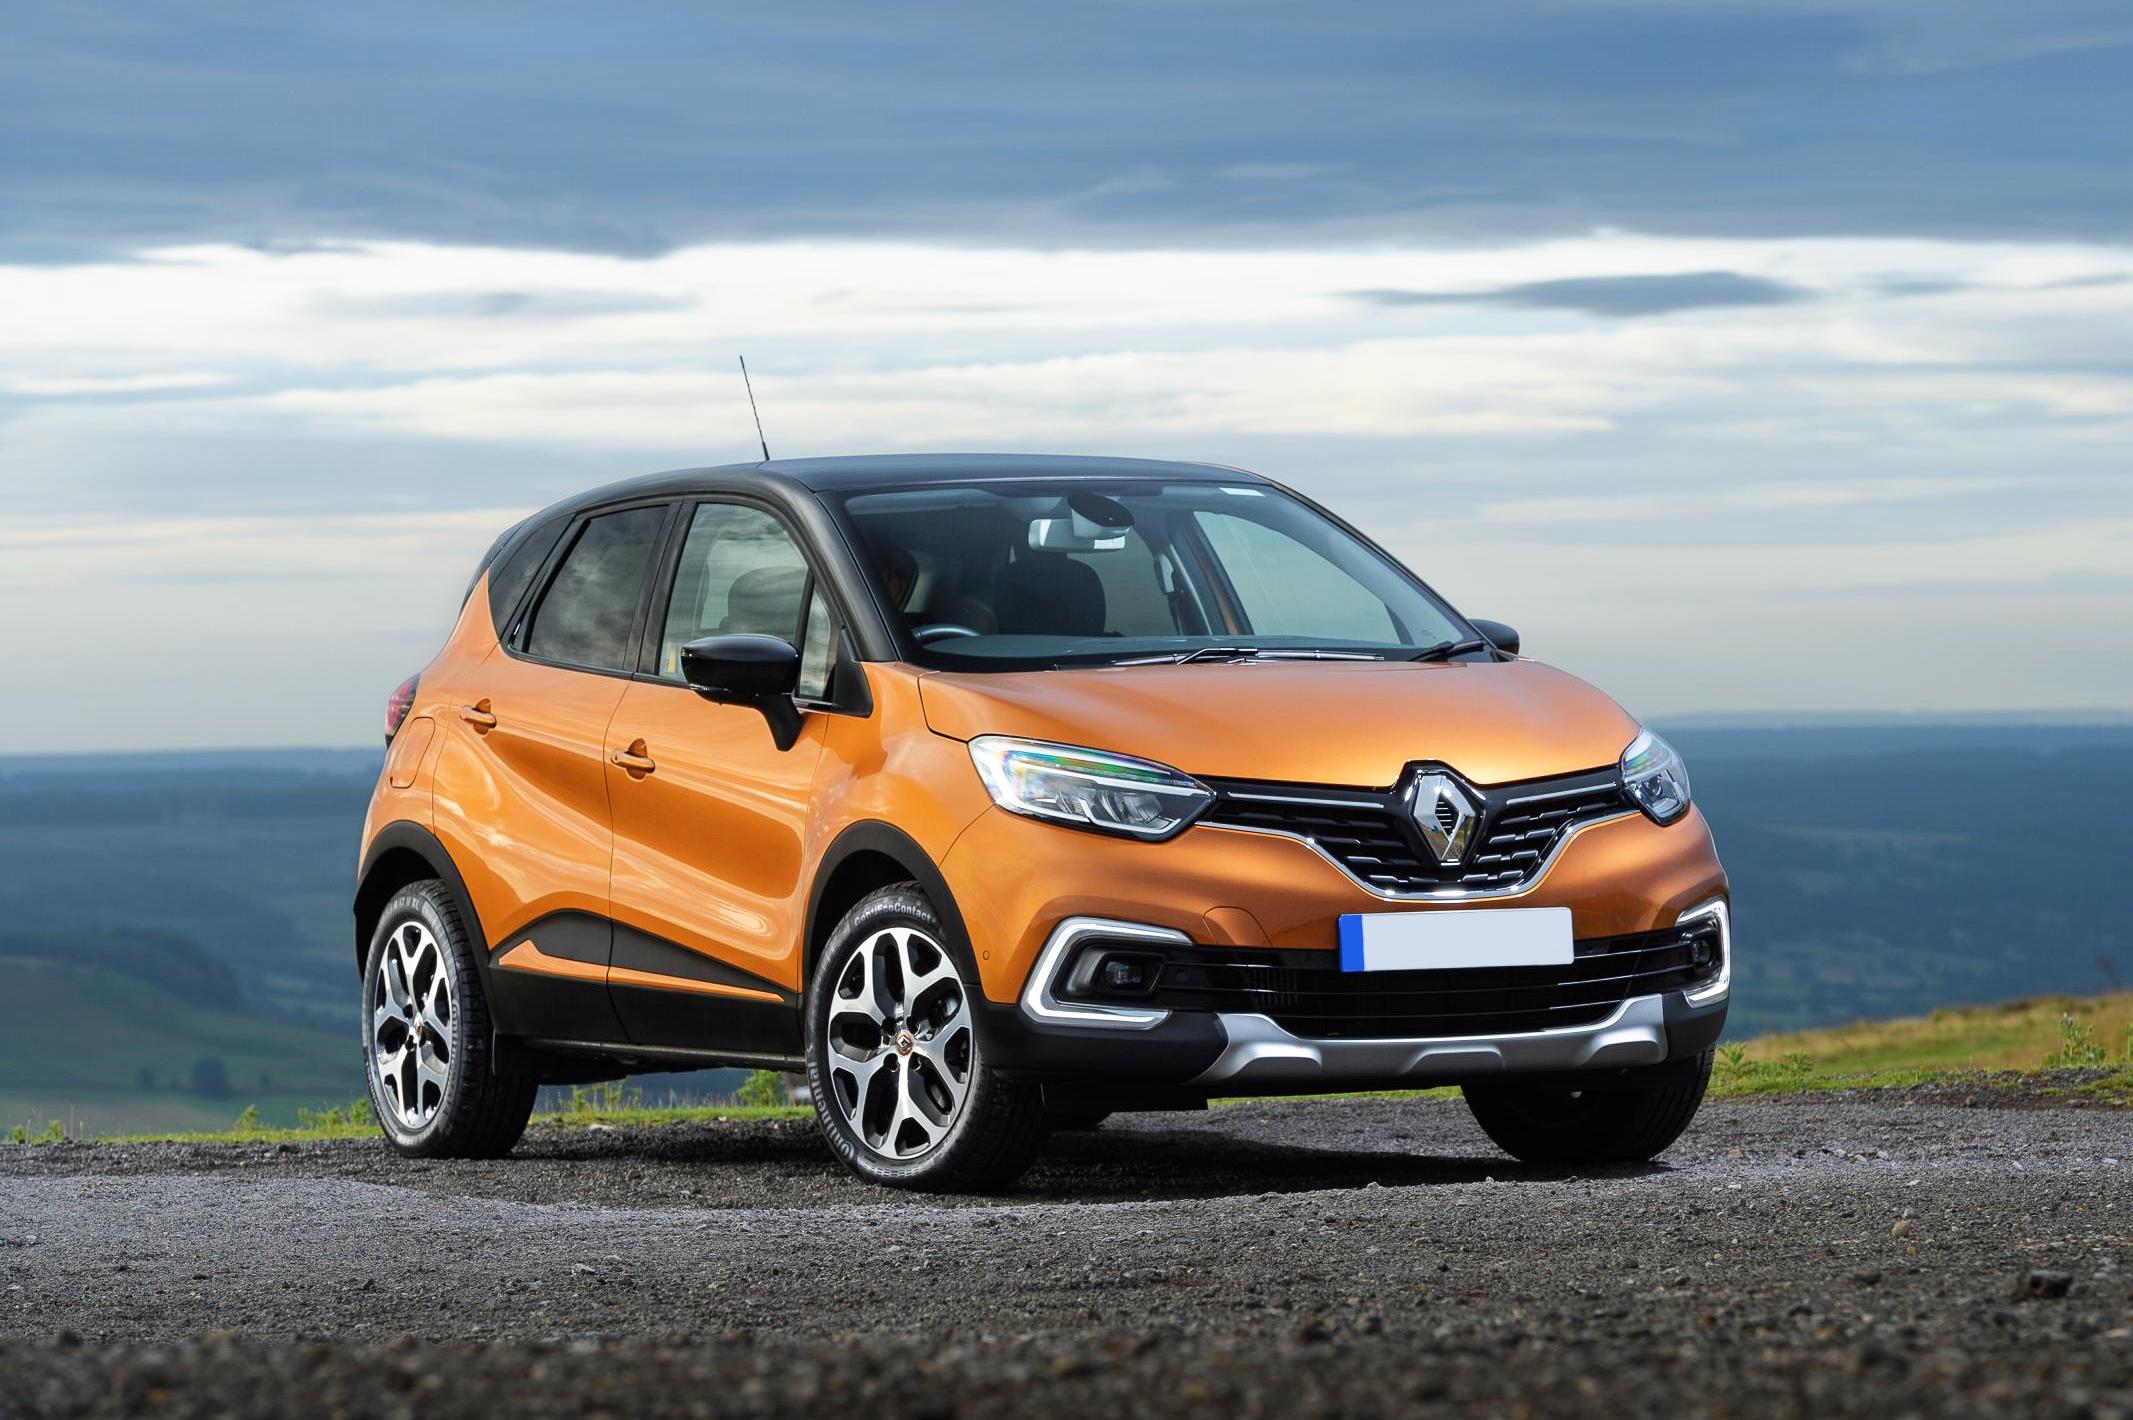 Renault Captur image.jpg (1.15 MB)